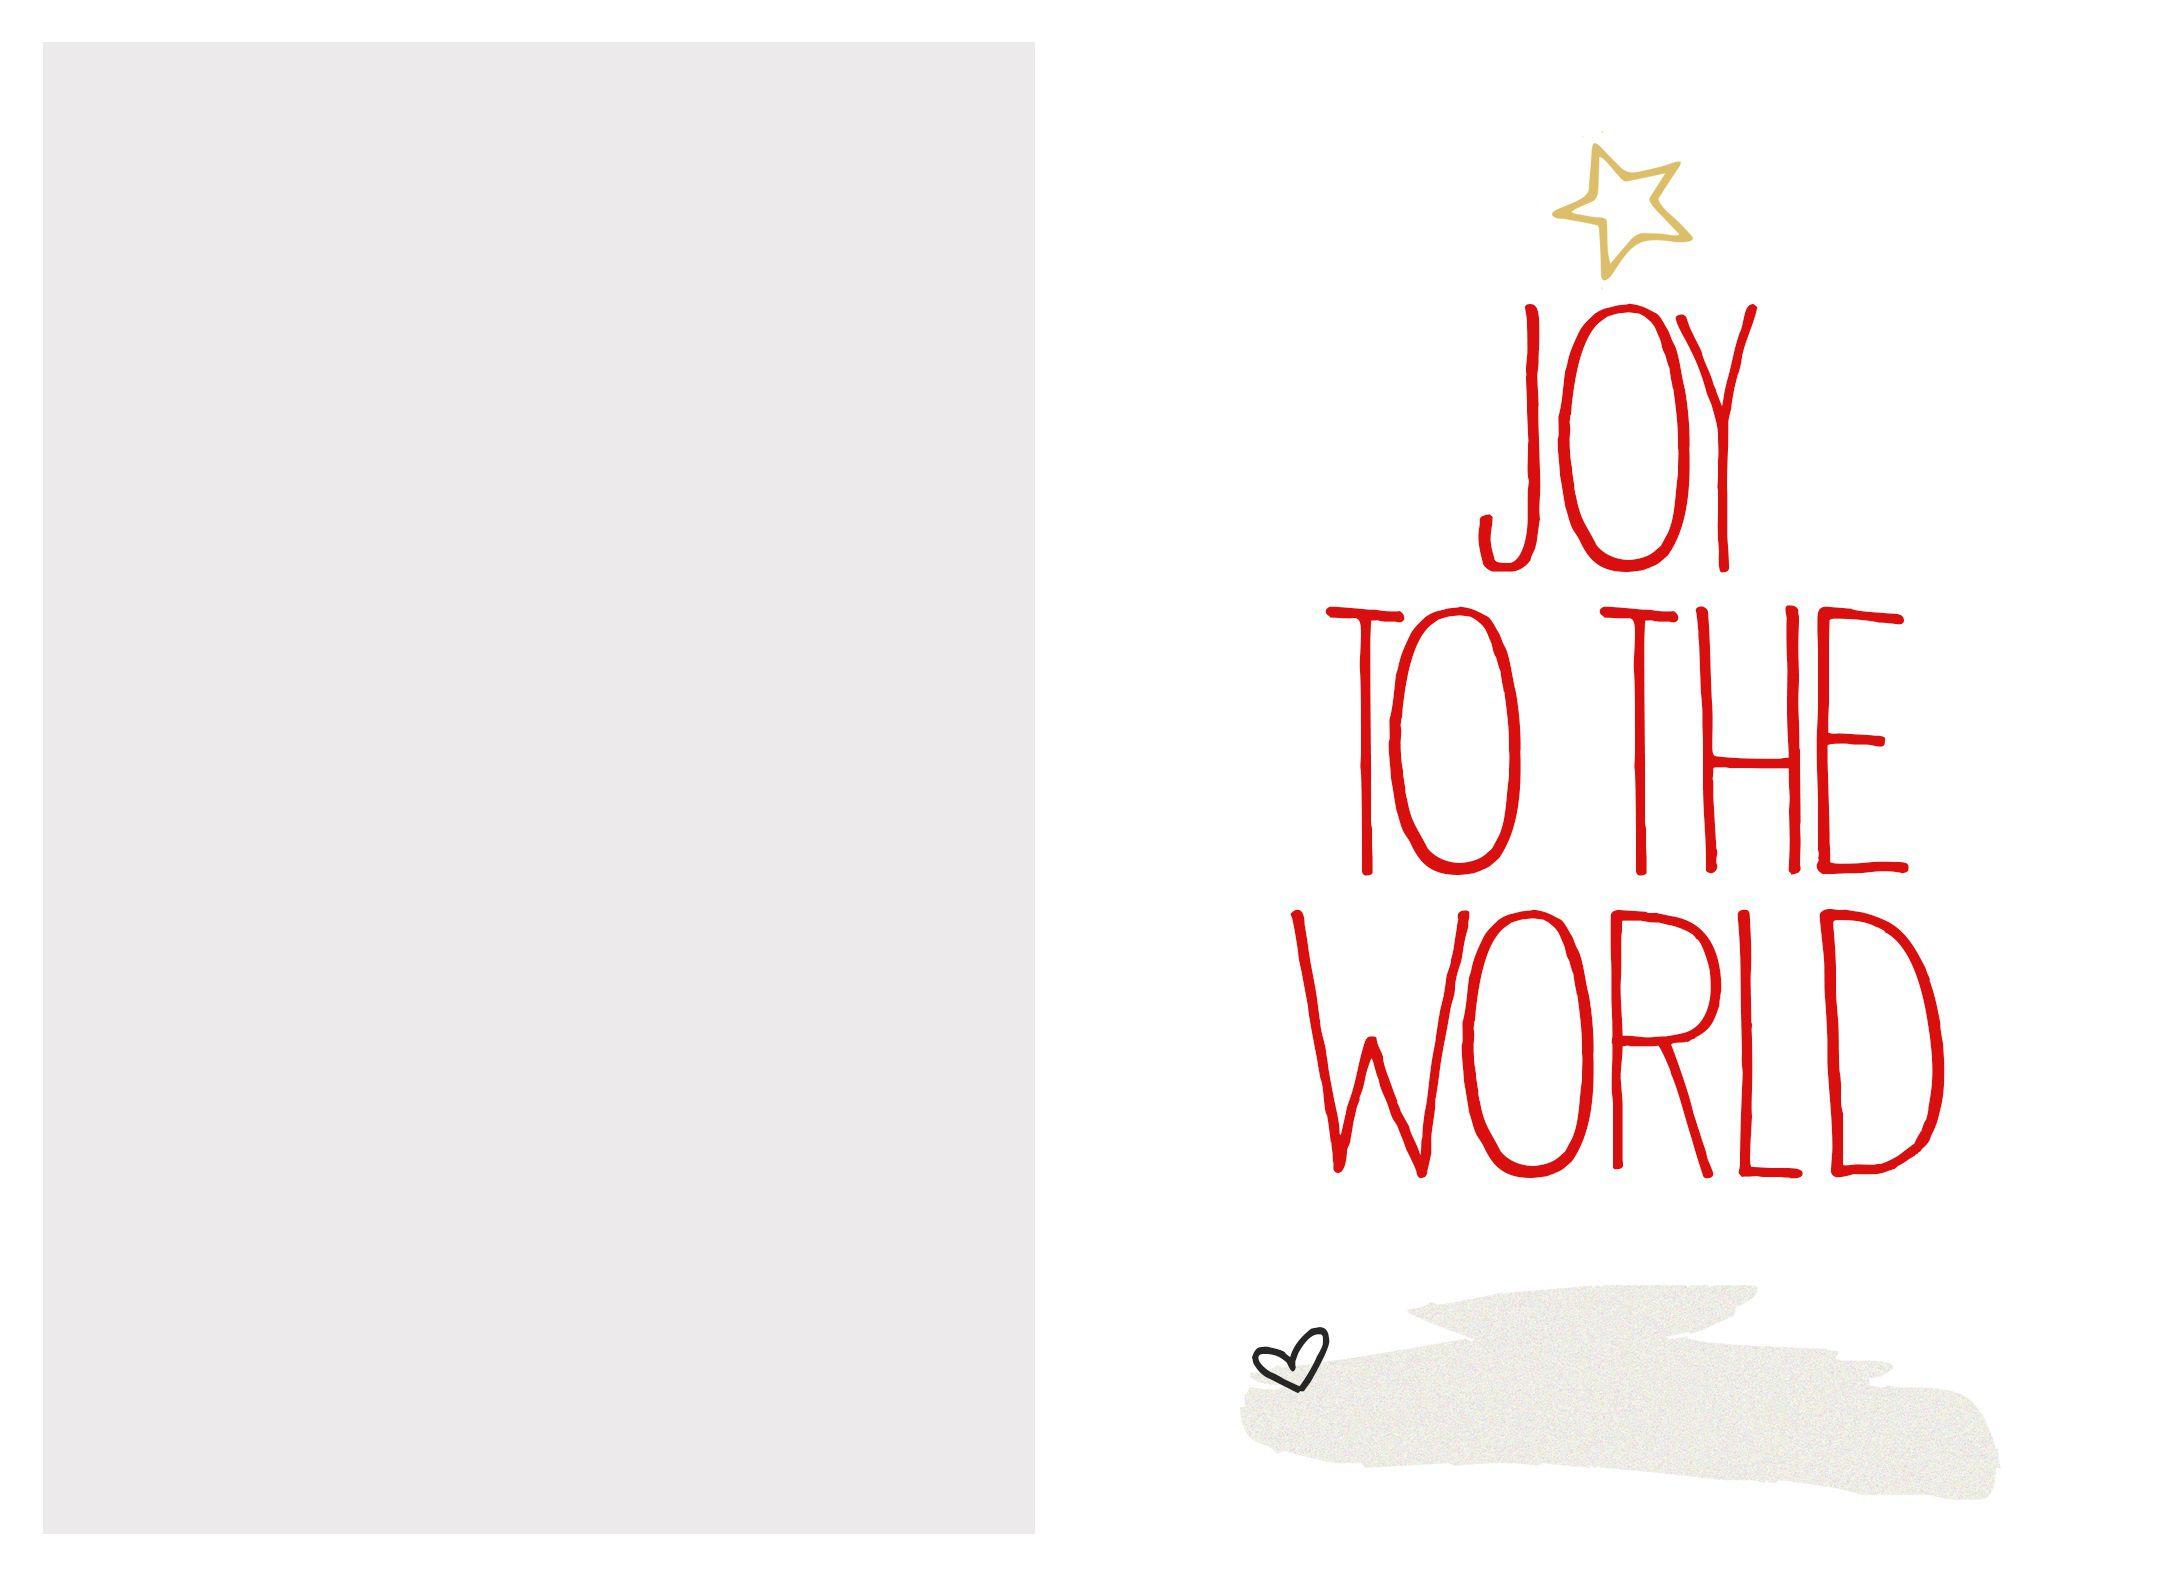 004 Wonderful Free Printable Religiou Christma Card Template Example  TemplatesFull